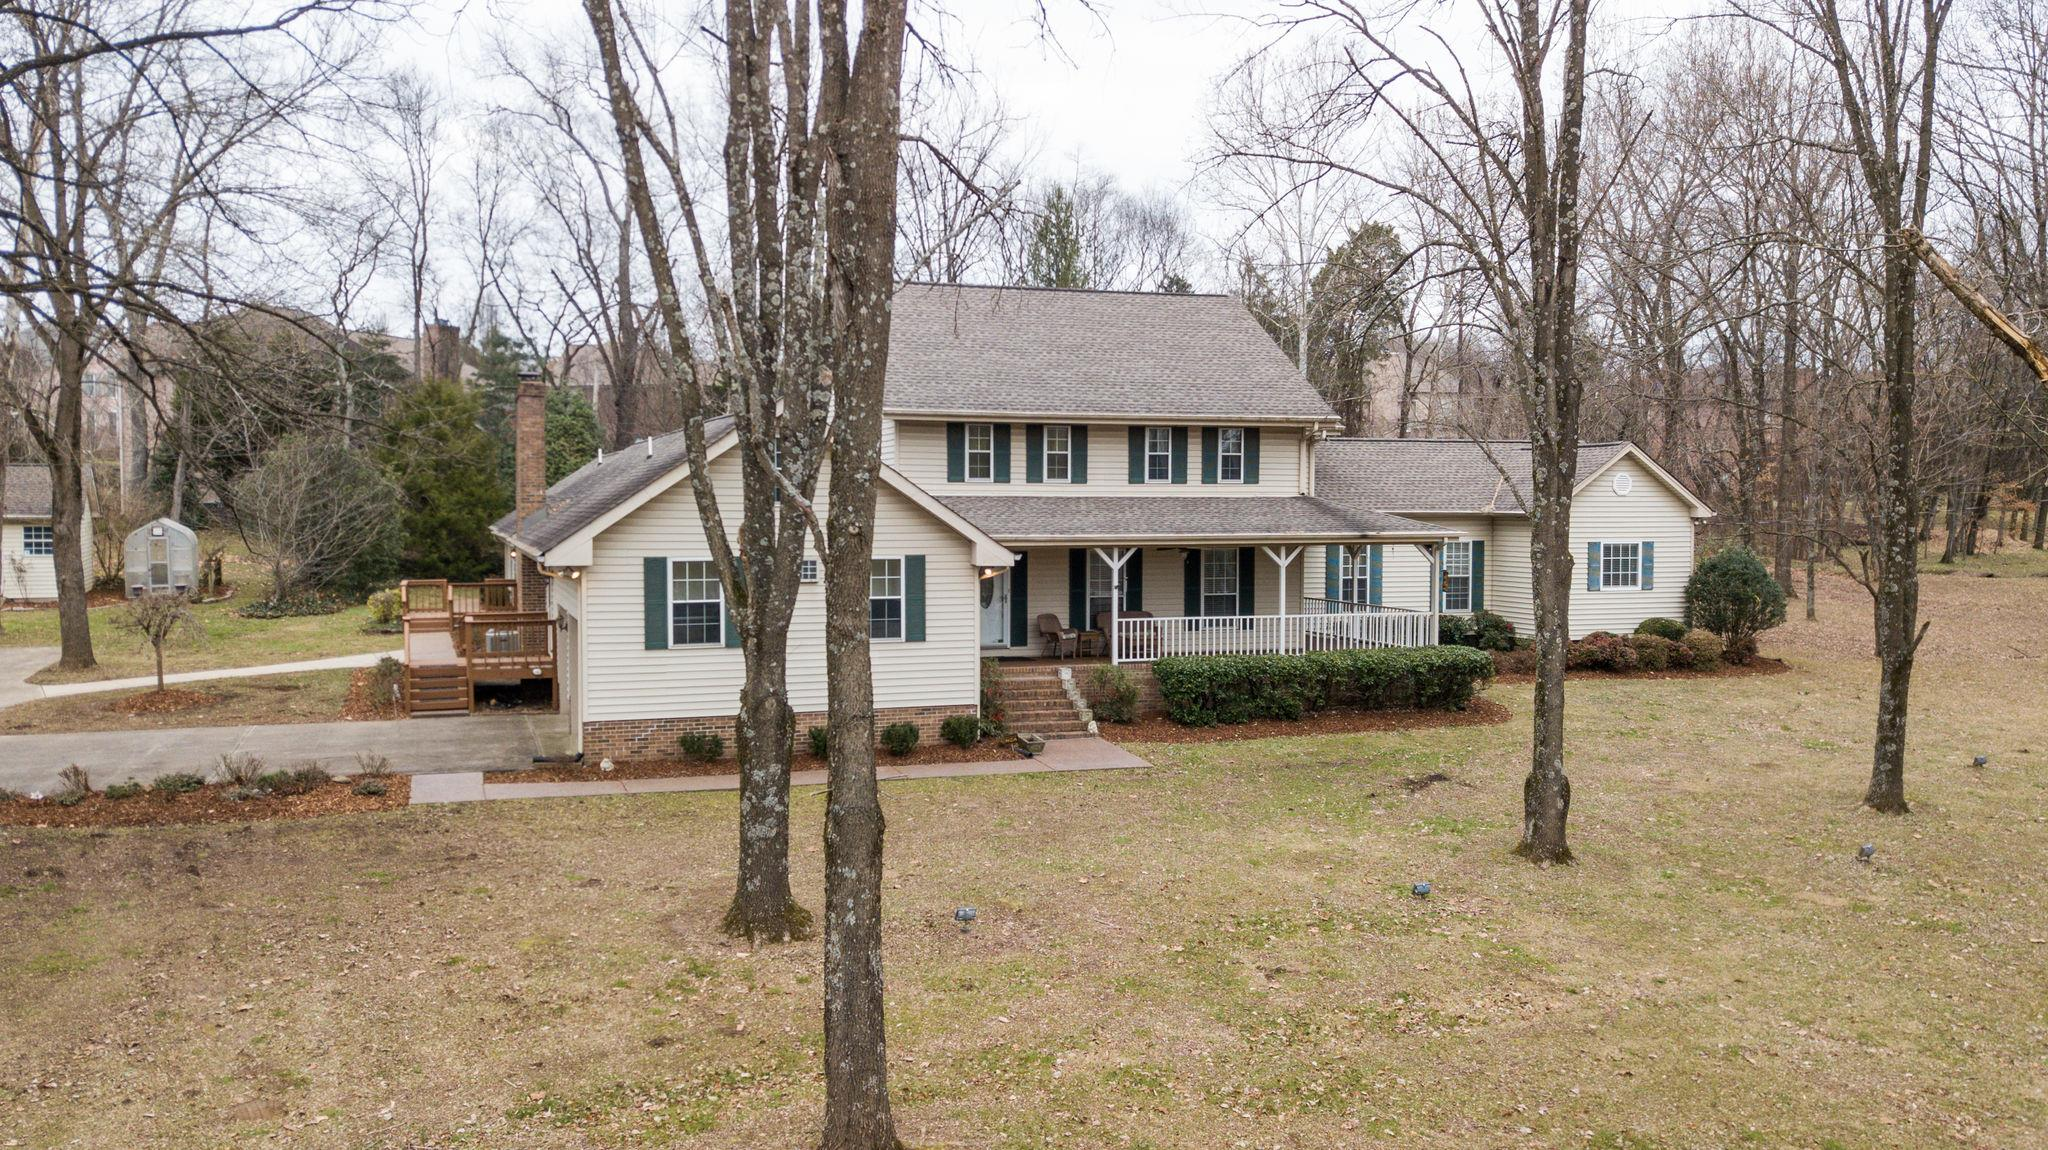 6776 Holt Rd, Nashville-Southeast, Tennessee